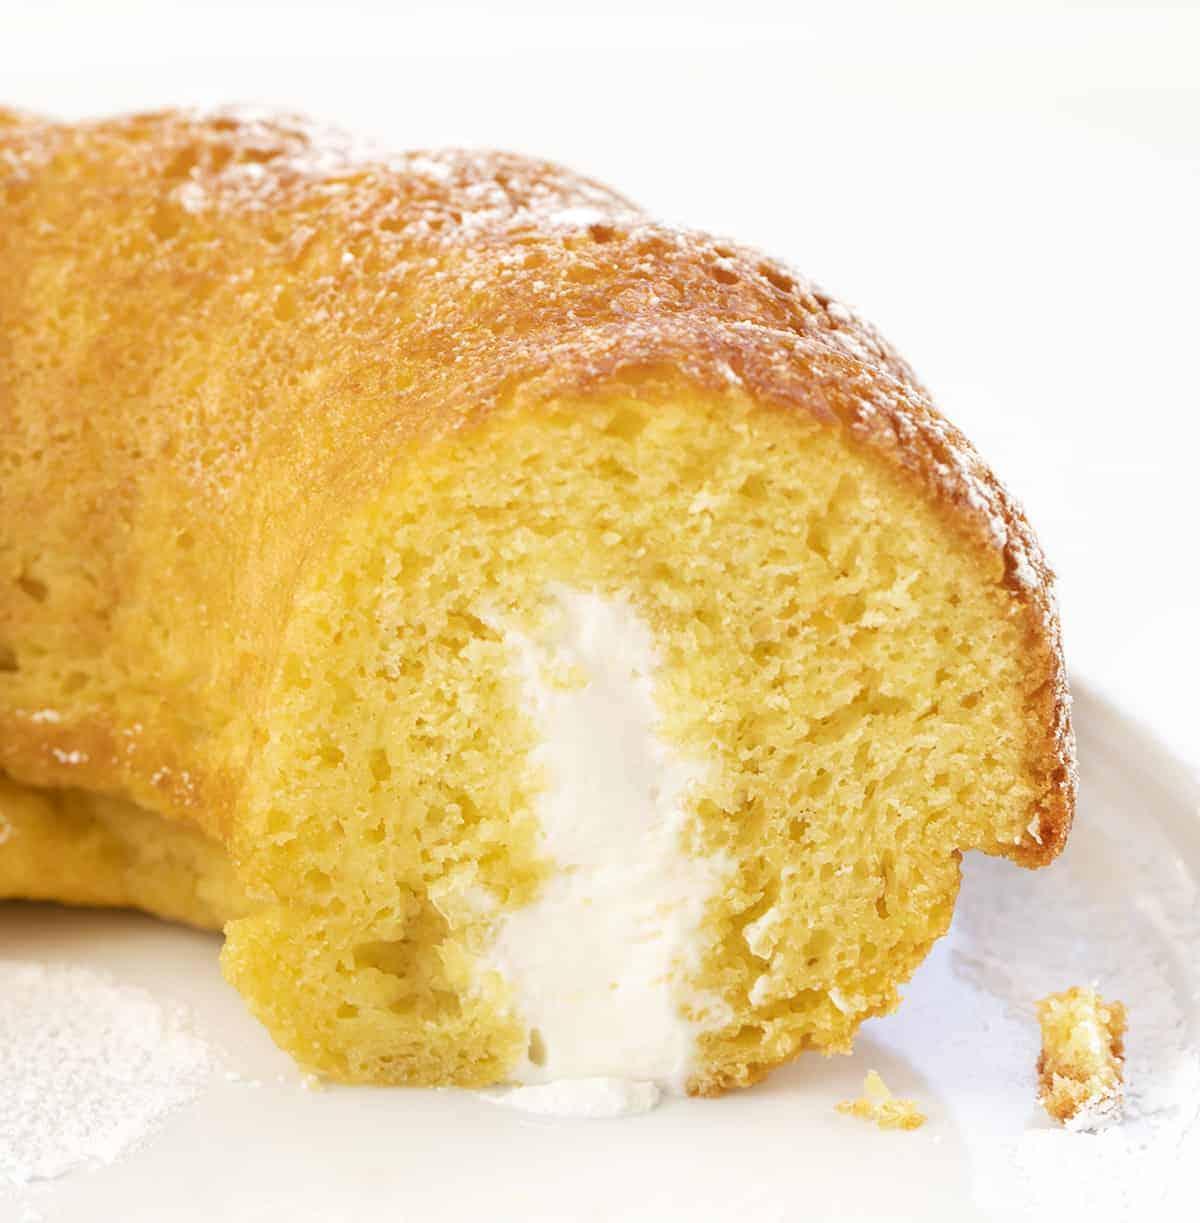 Sliced Into Cream Filled Yellow Cake {Twinkies Copycat}